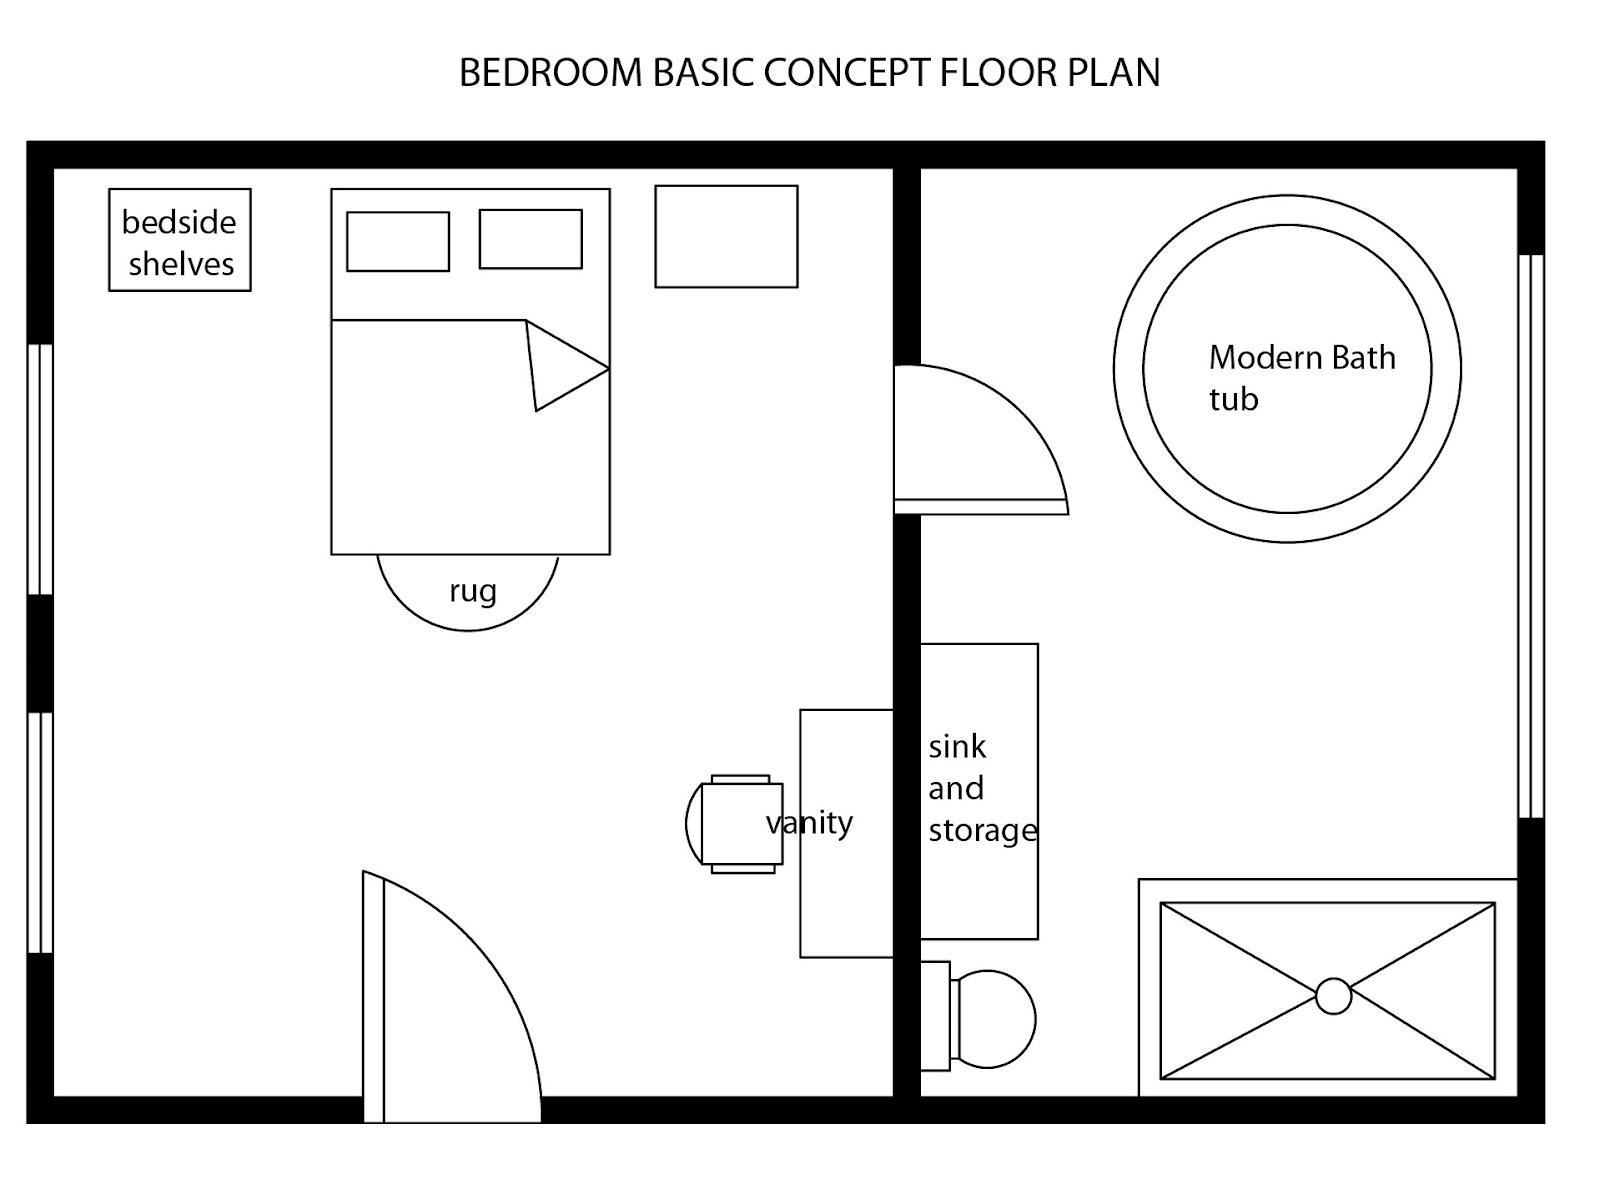 Design Floor Plan For Bathroom Home Decorating